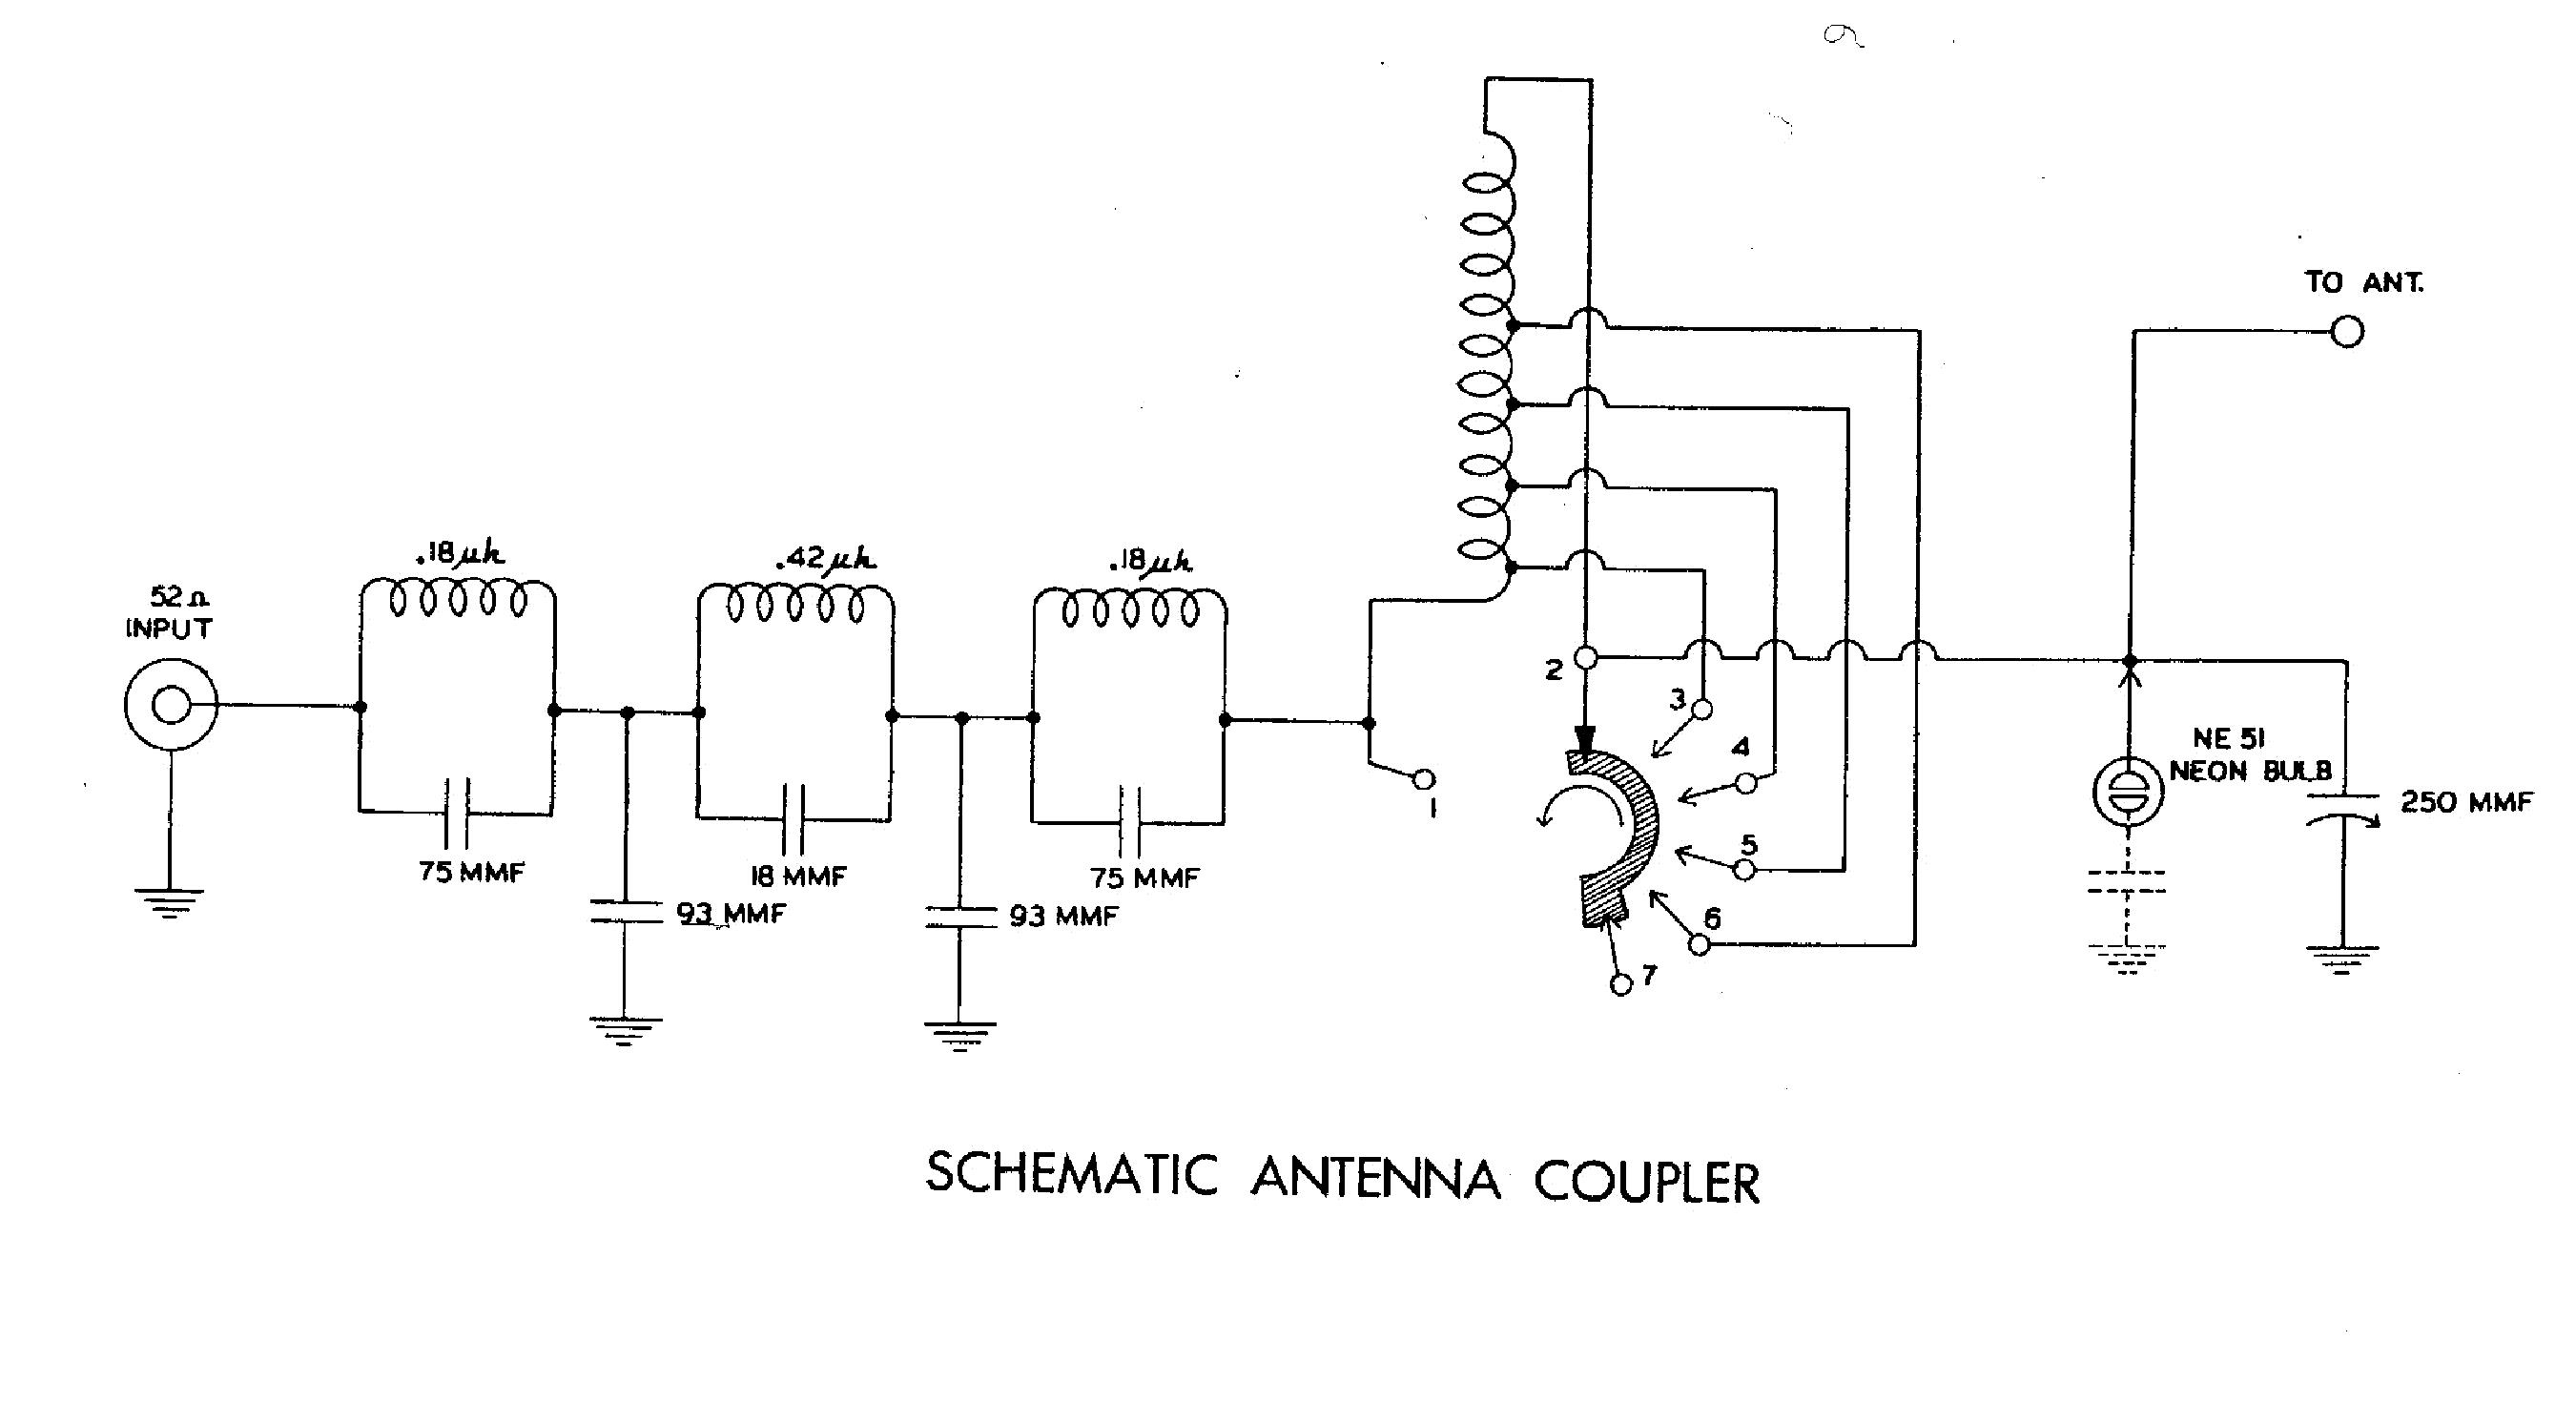 HEATHKIT AC-1 ANTENNE COUPLER ANTENNA CSATOLO SCH service manual (1st page)